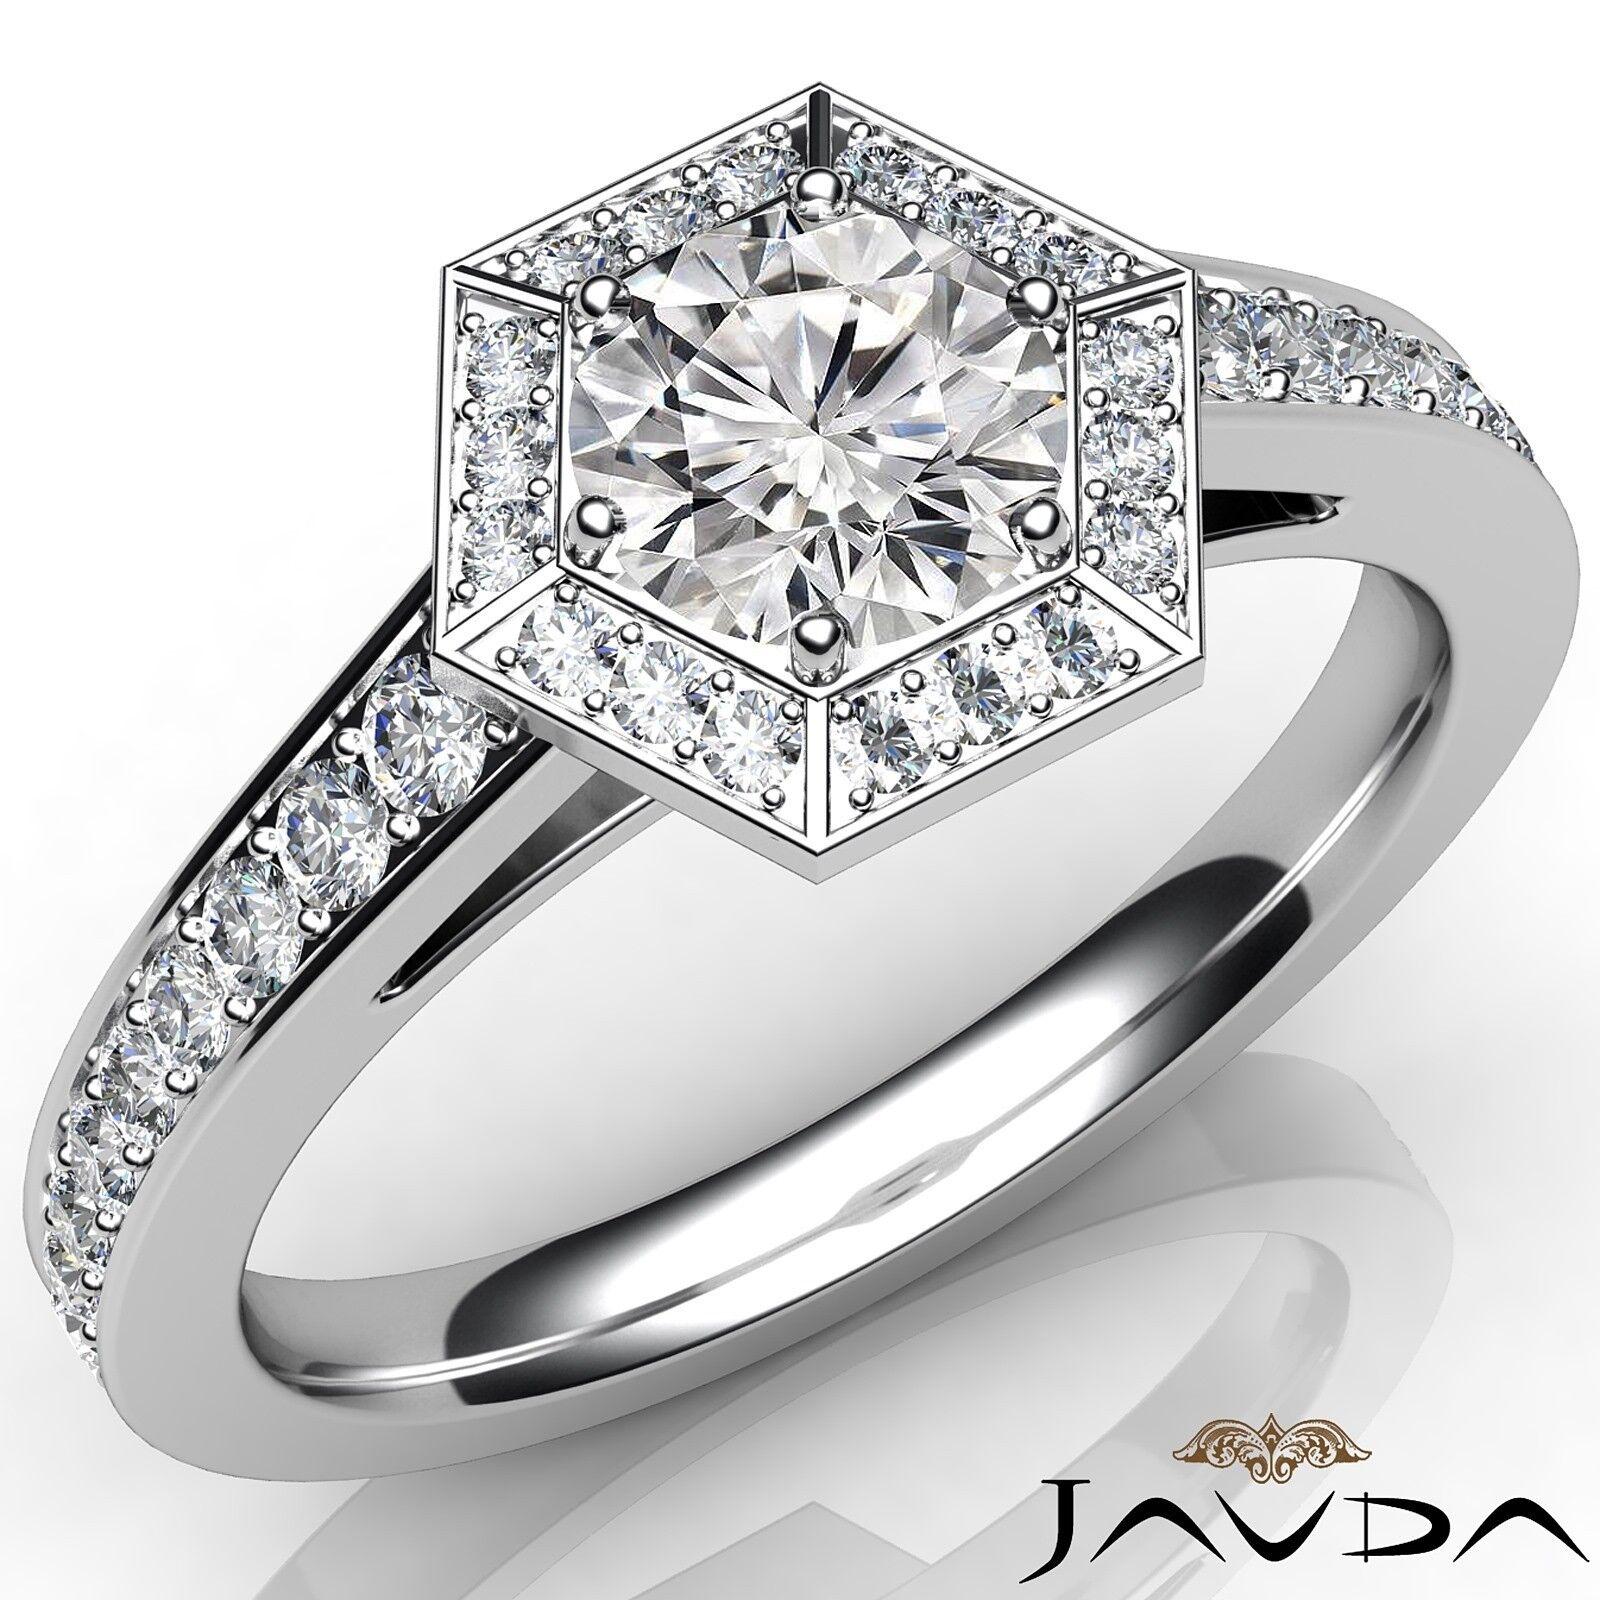 1.2ctw Comfort Fit Round Diamond Engagement Ring GIA E-VVS1 White Gold Women New